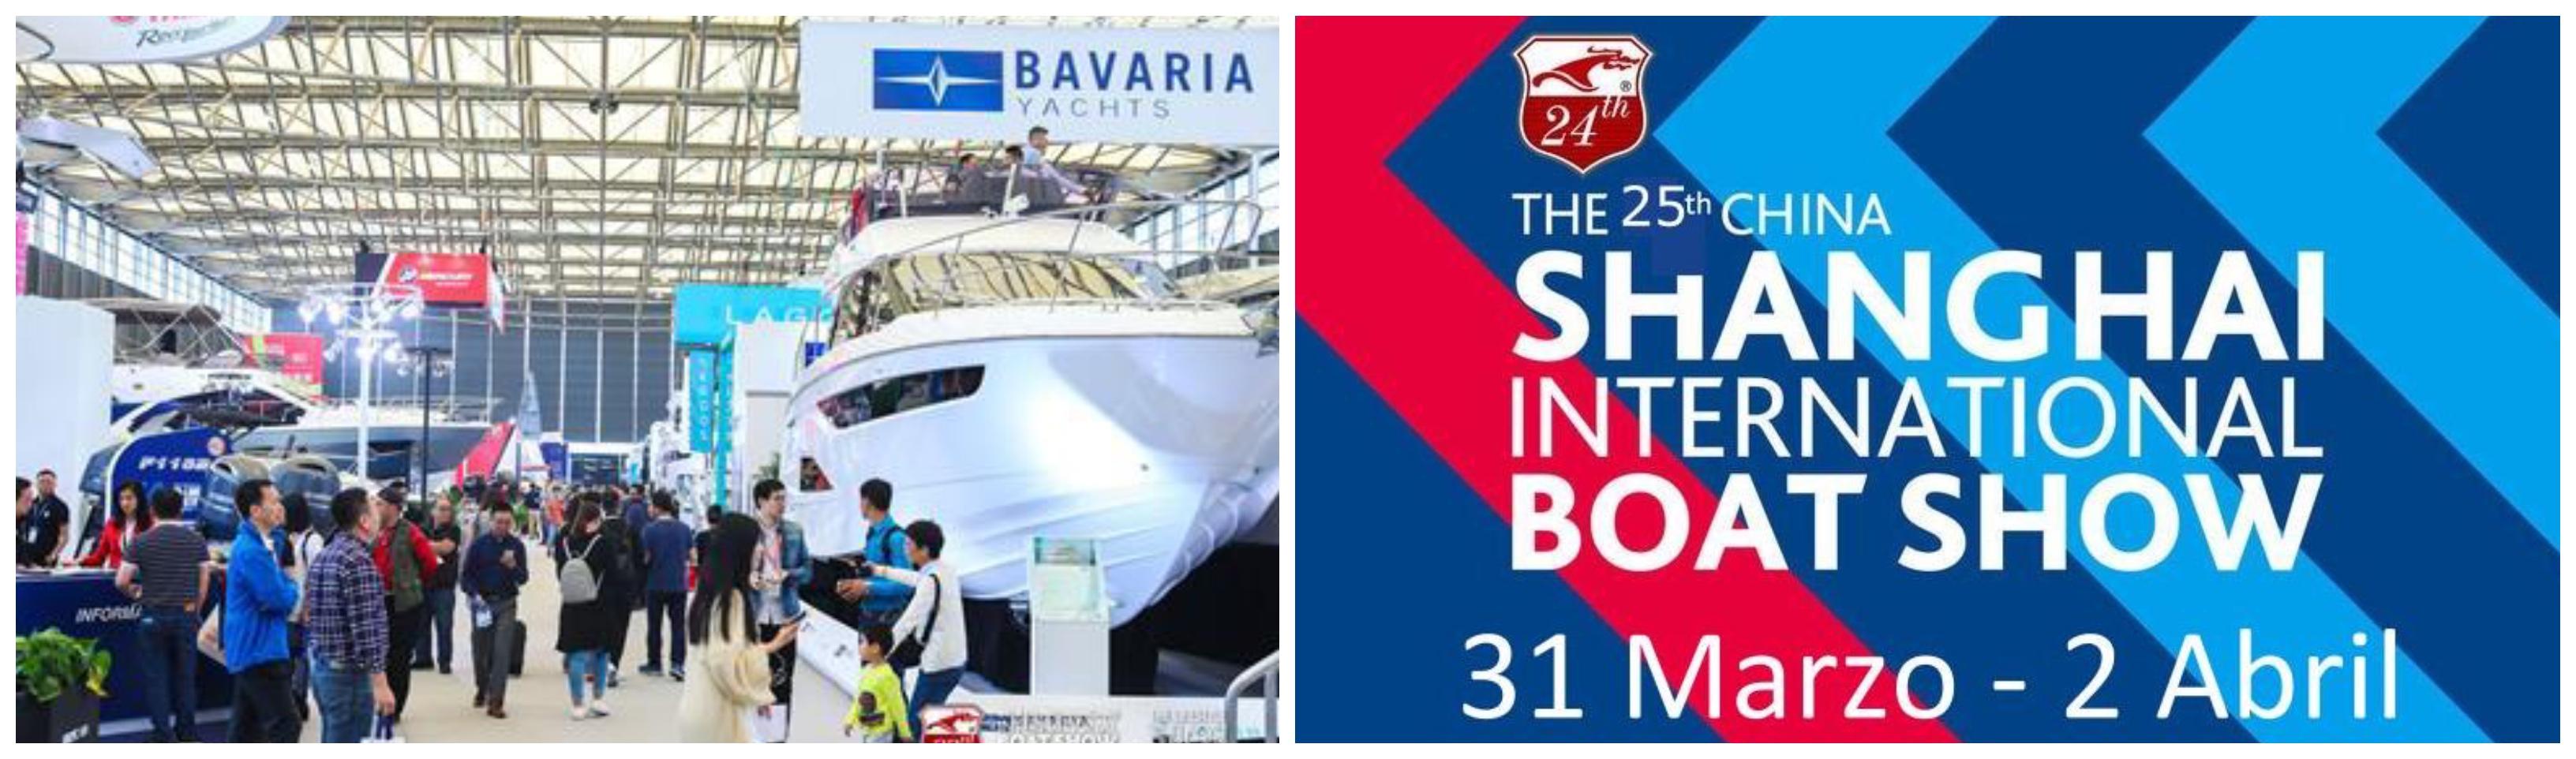 shangai boat show